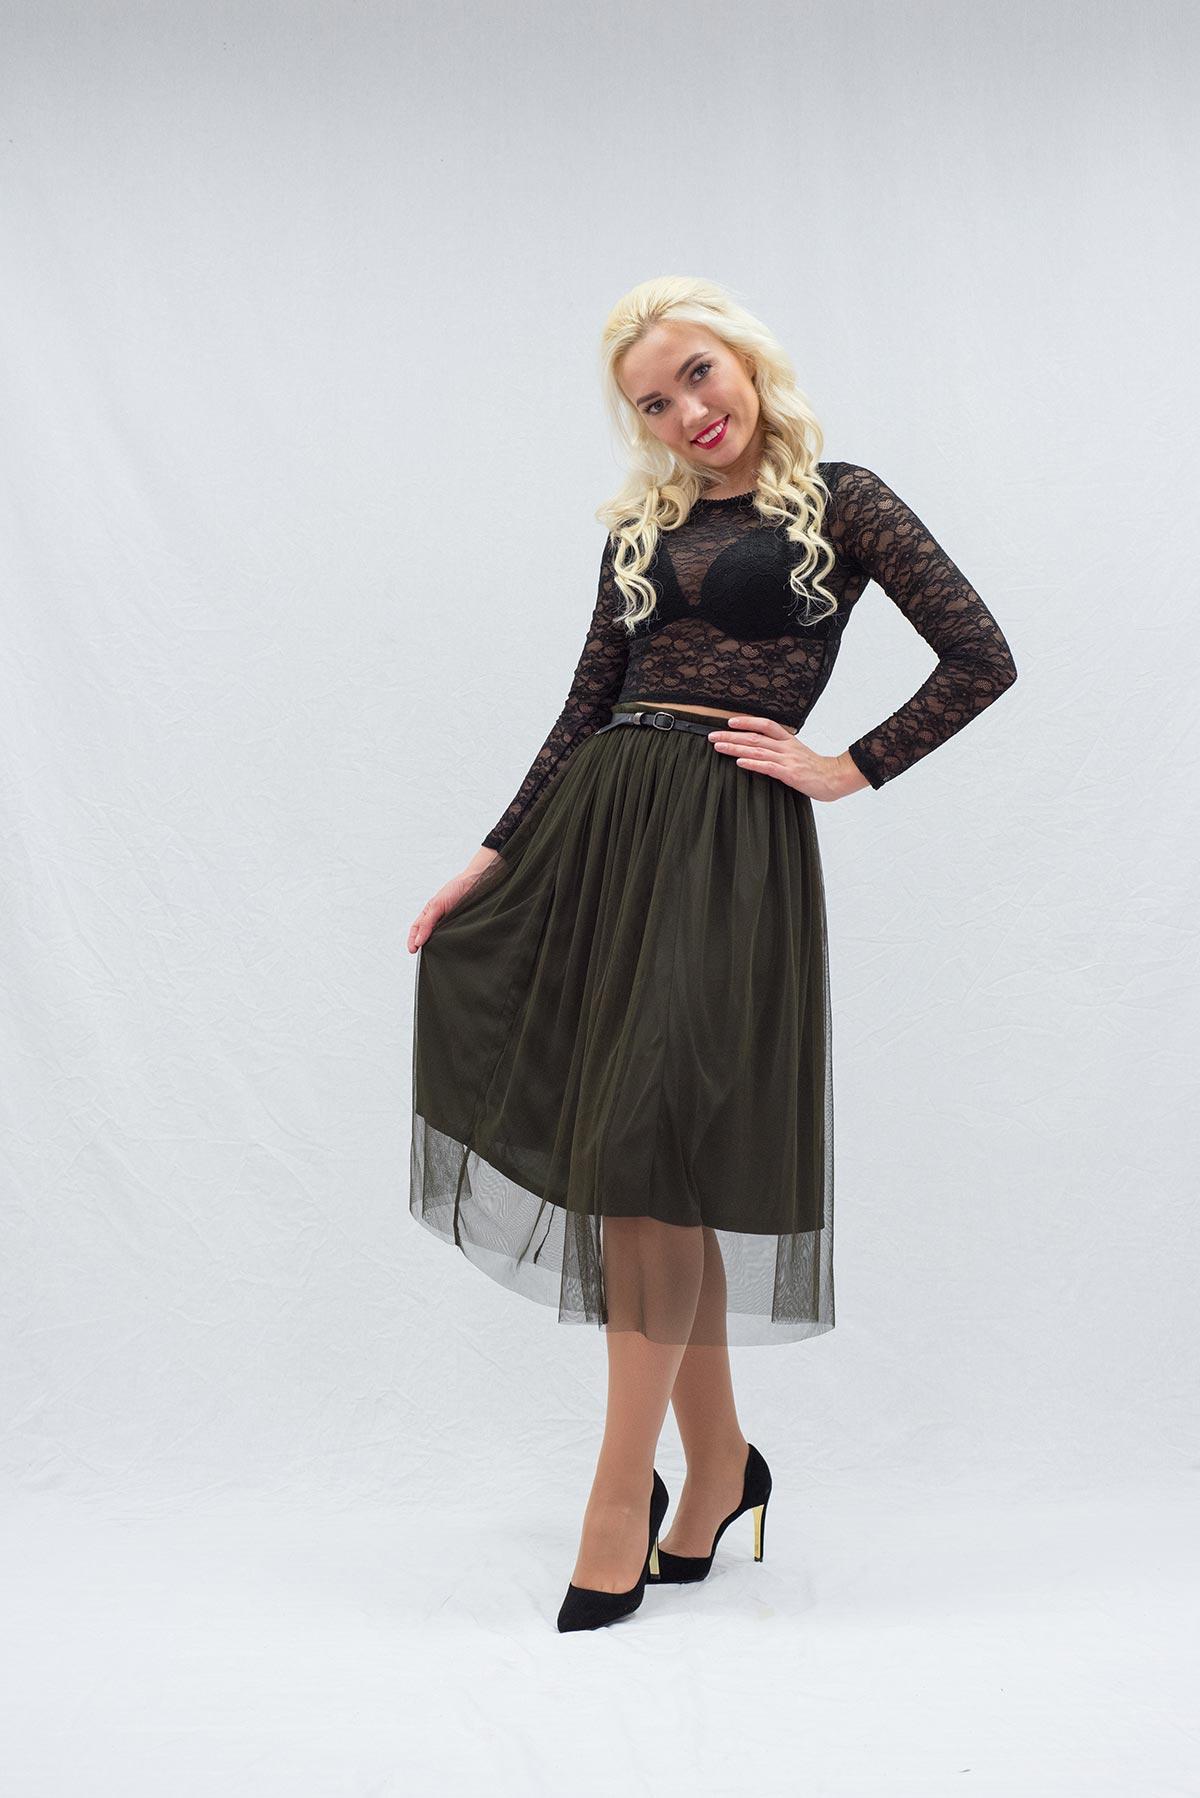 60e62b7be0a Naiste kleidid   Kleit AV112   Kleitide rent   printsess.eu